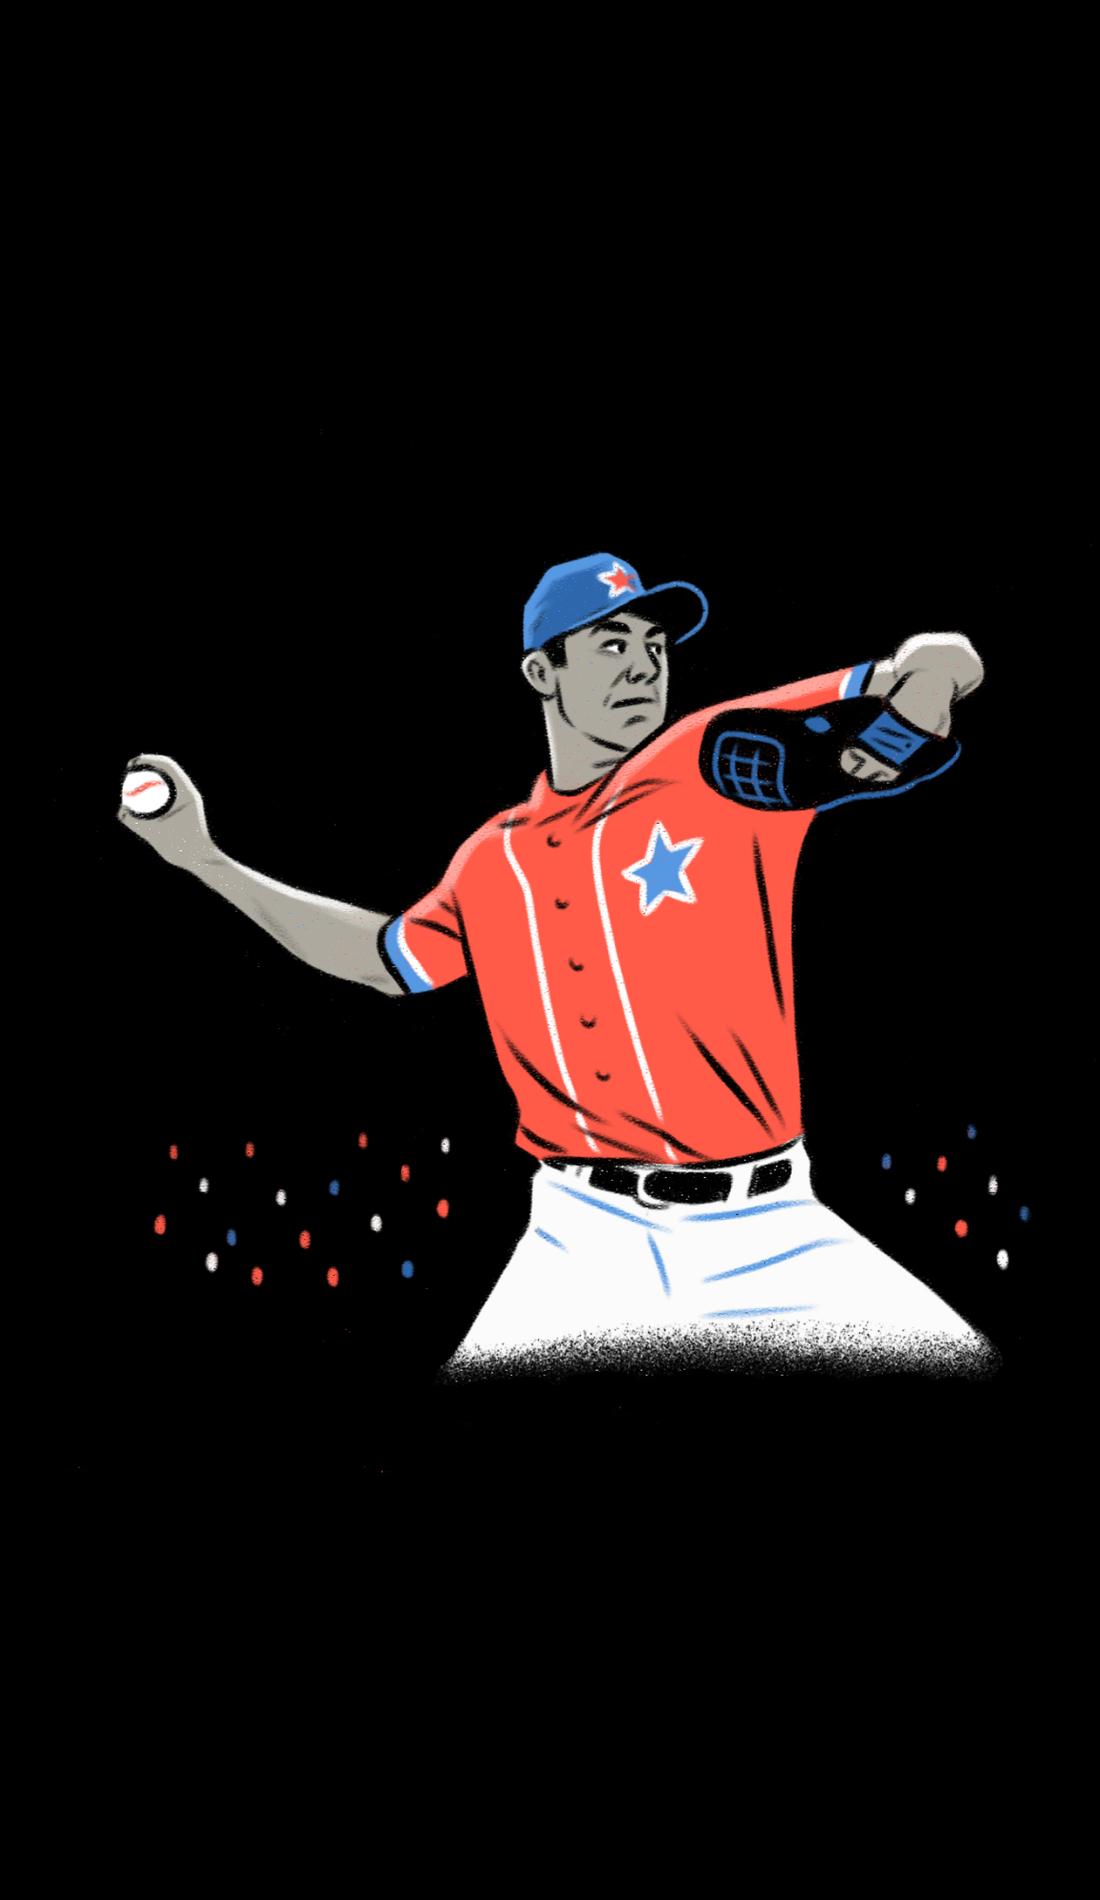 A Maryland Terrapins Baseball live event